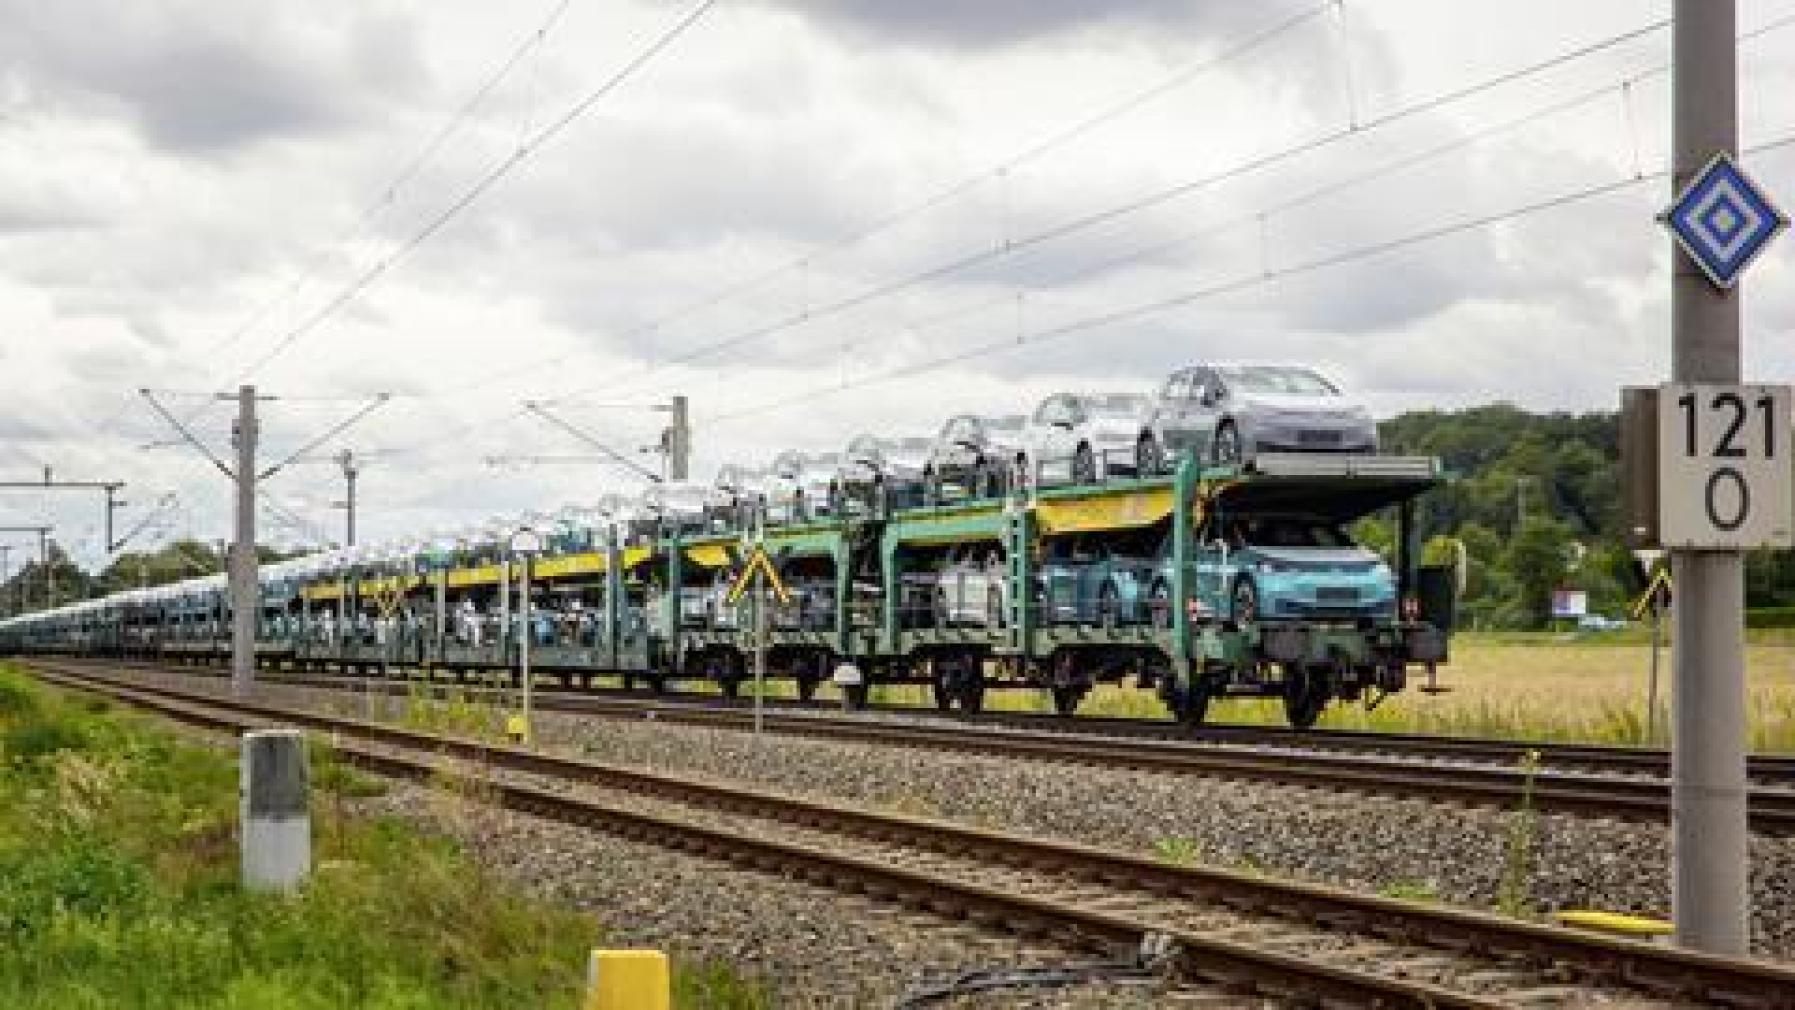 VW ID.3 train